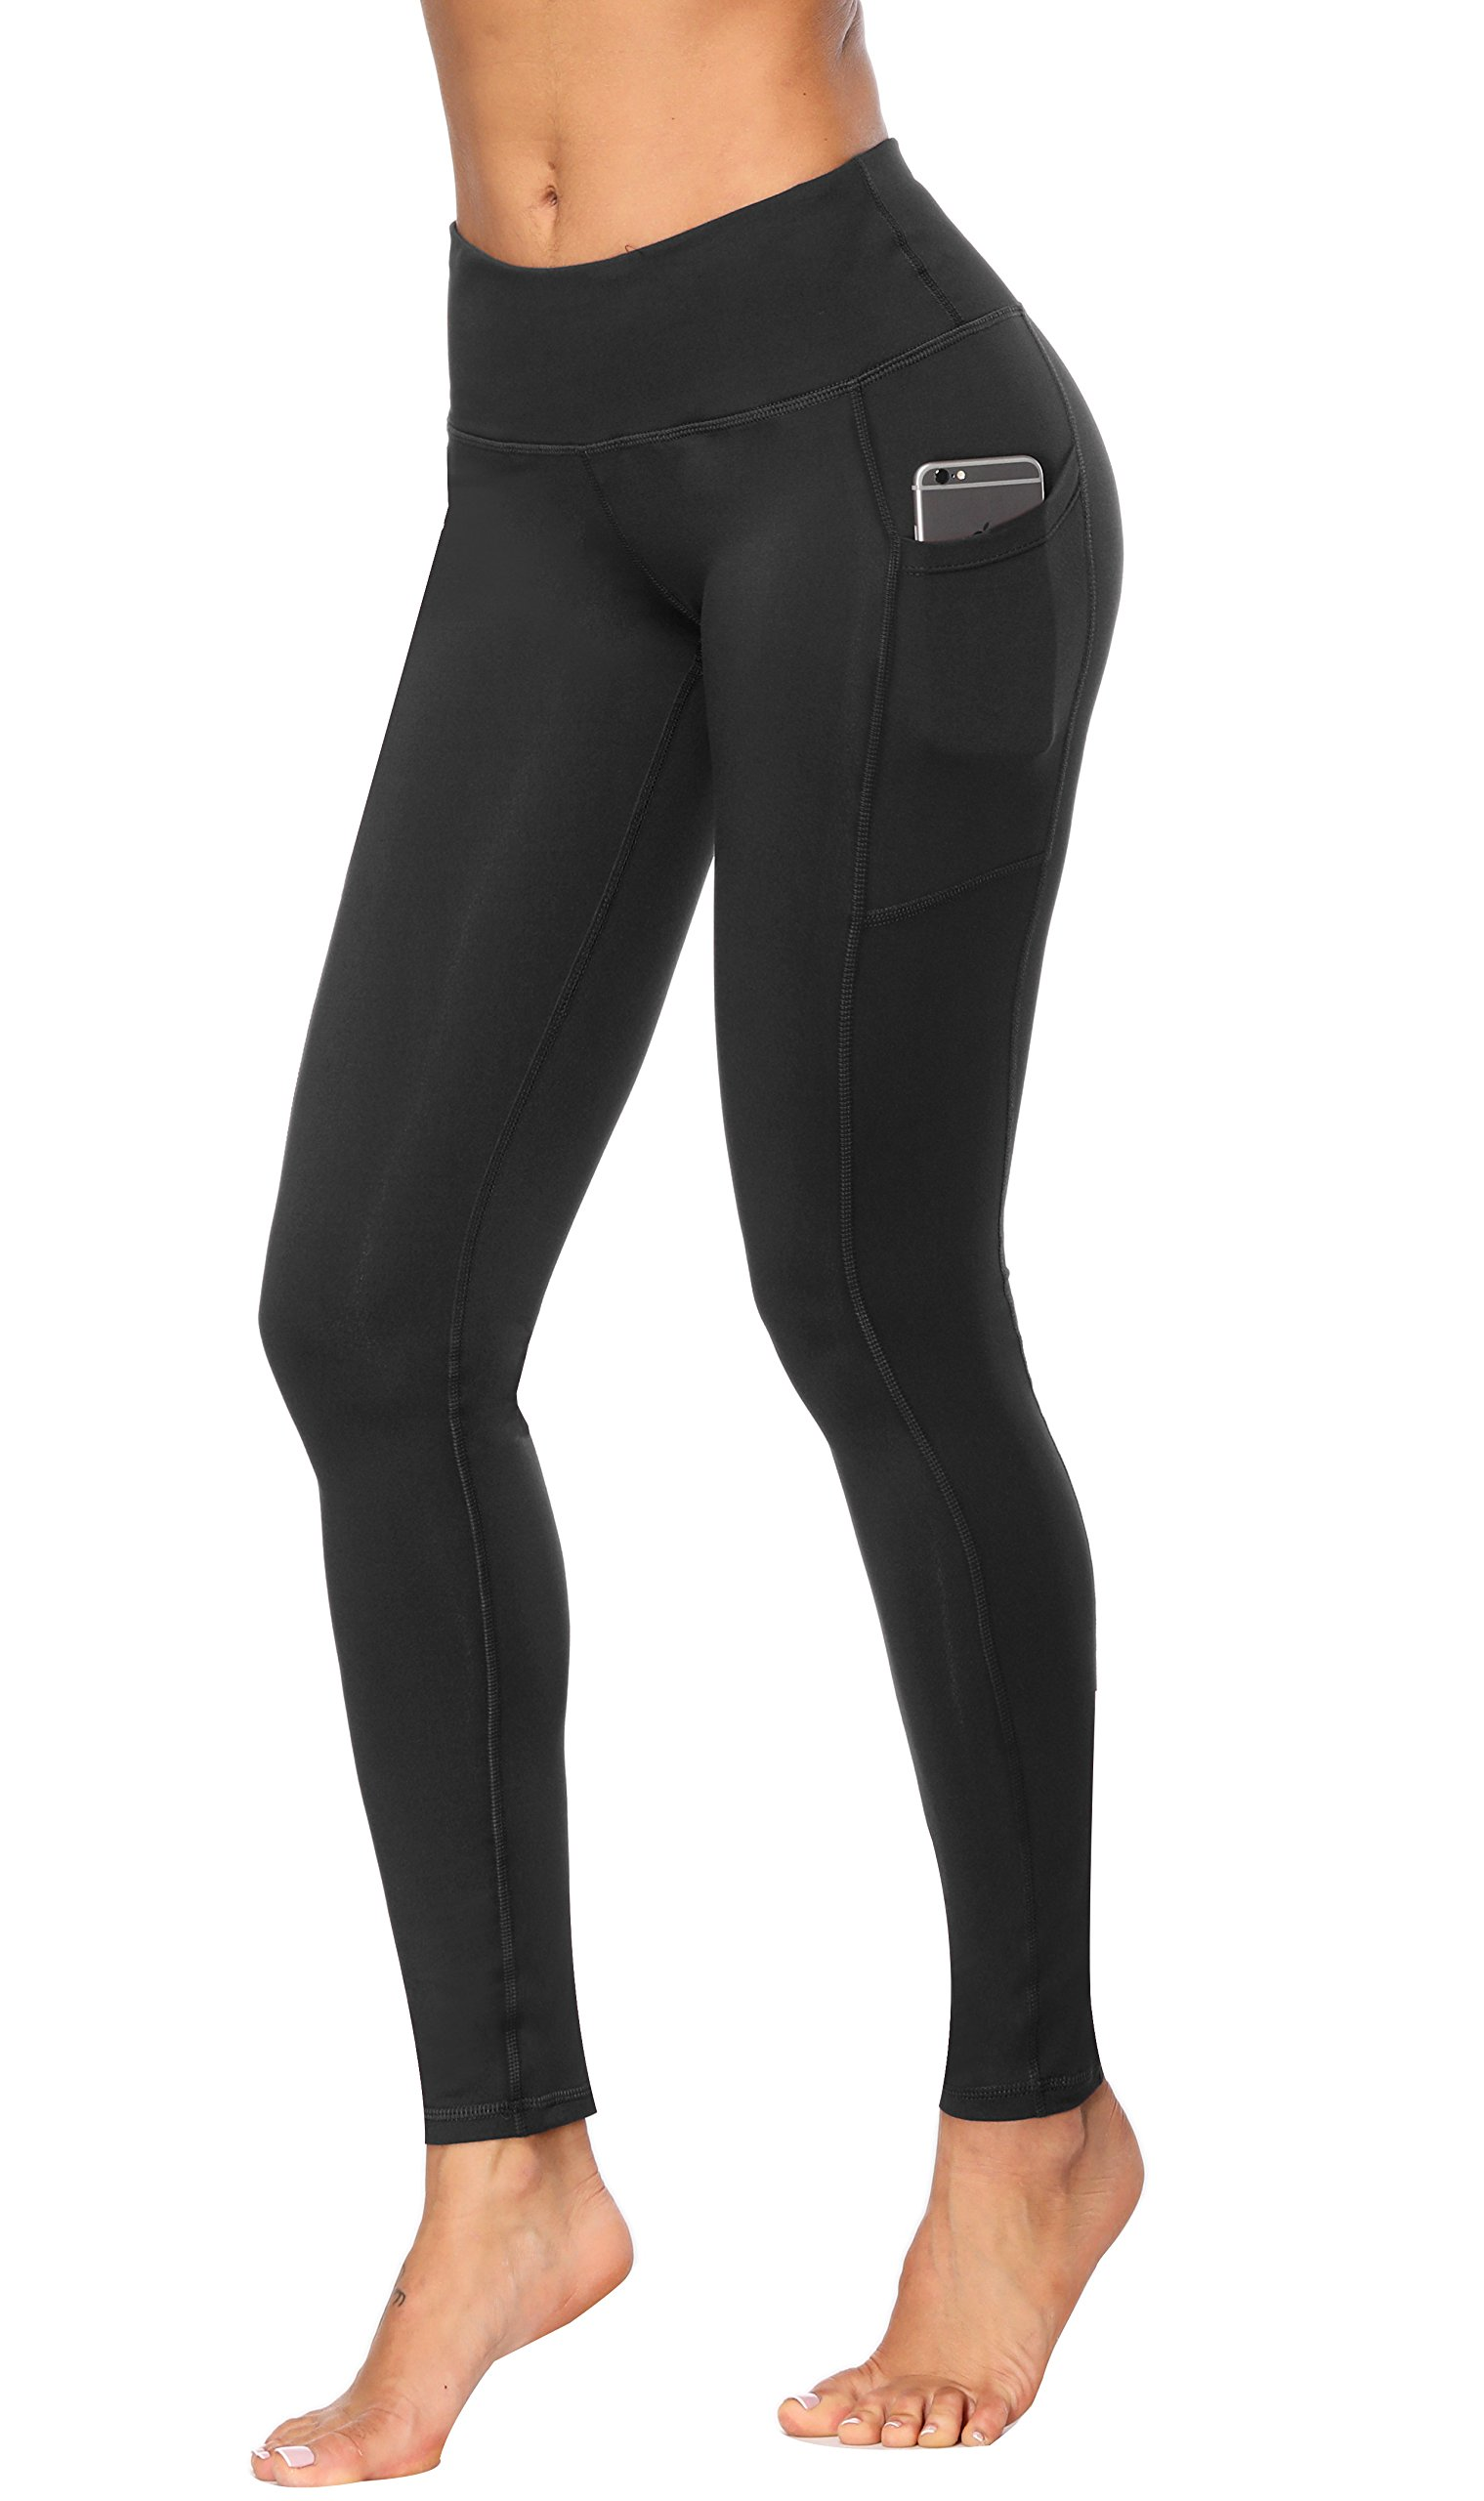 77c78810181e65 Fengbay High Waist Yoga Pants, Pocket Yoga Pants Tummy Control Workout  Running 4 Way Stretch Yoga Leggings